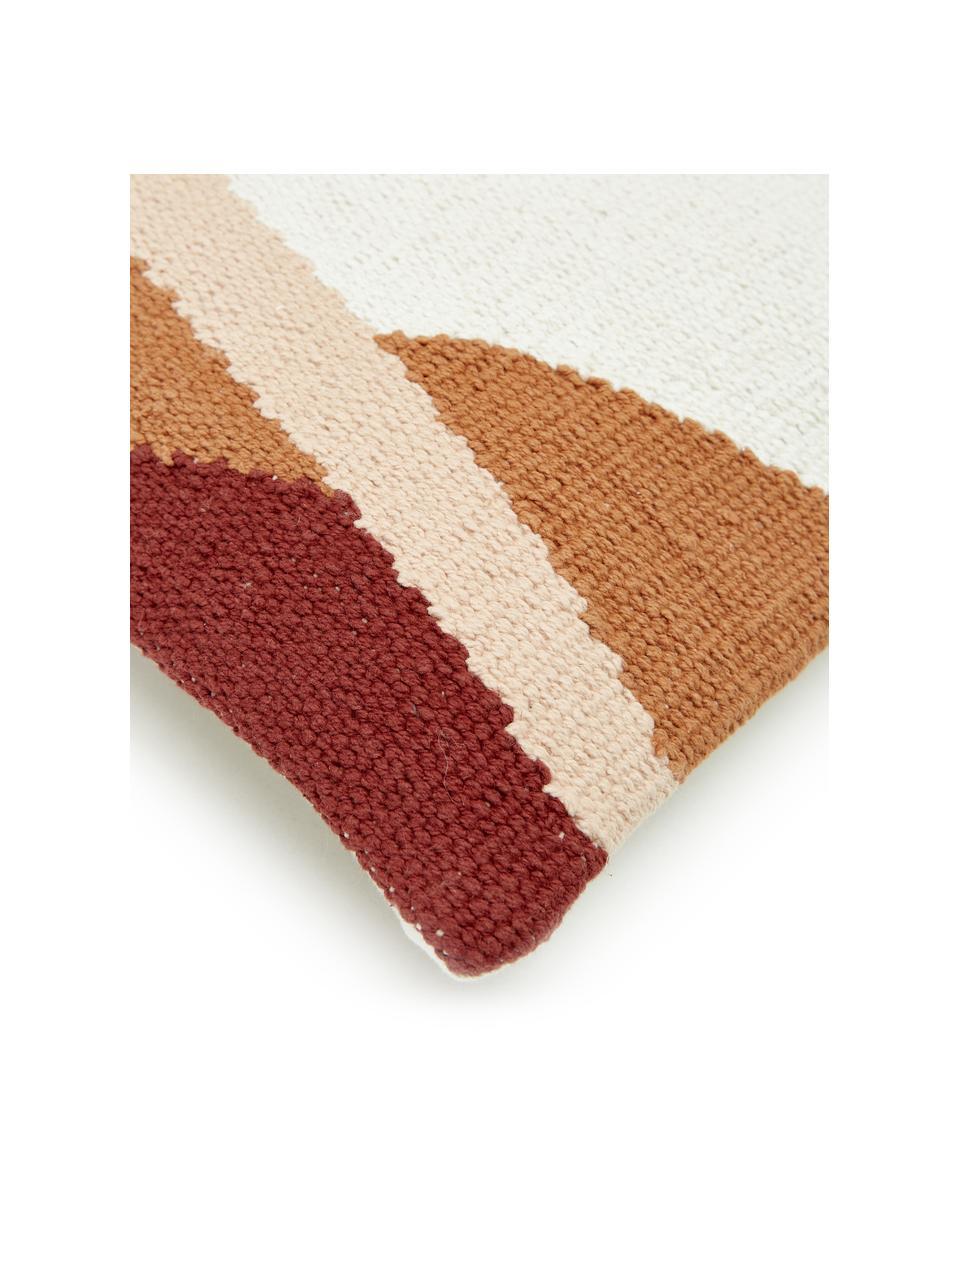 Federa arredo tessuta a mano con motivo astratto Beta, 100% cotone, Rosa, rosso, bianco, Larg. 30 x Lung. 50 cm